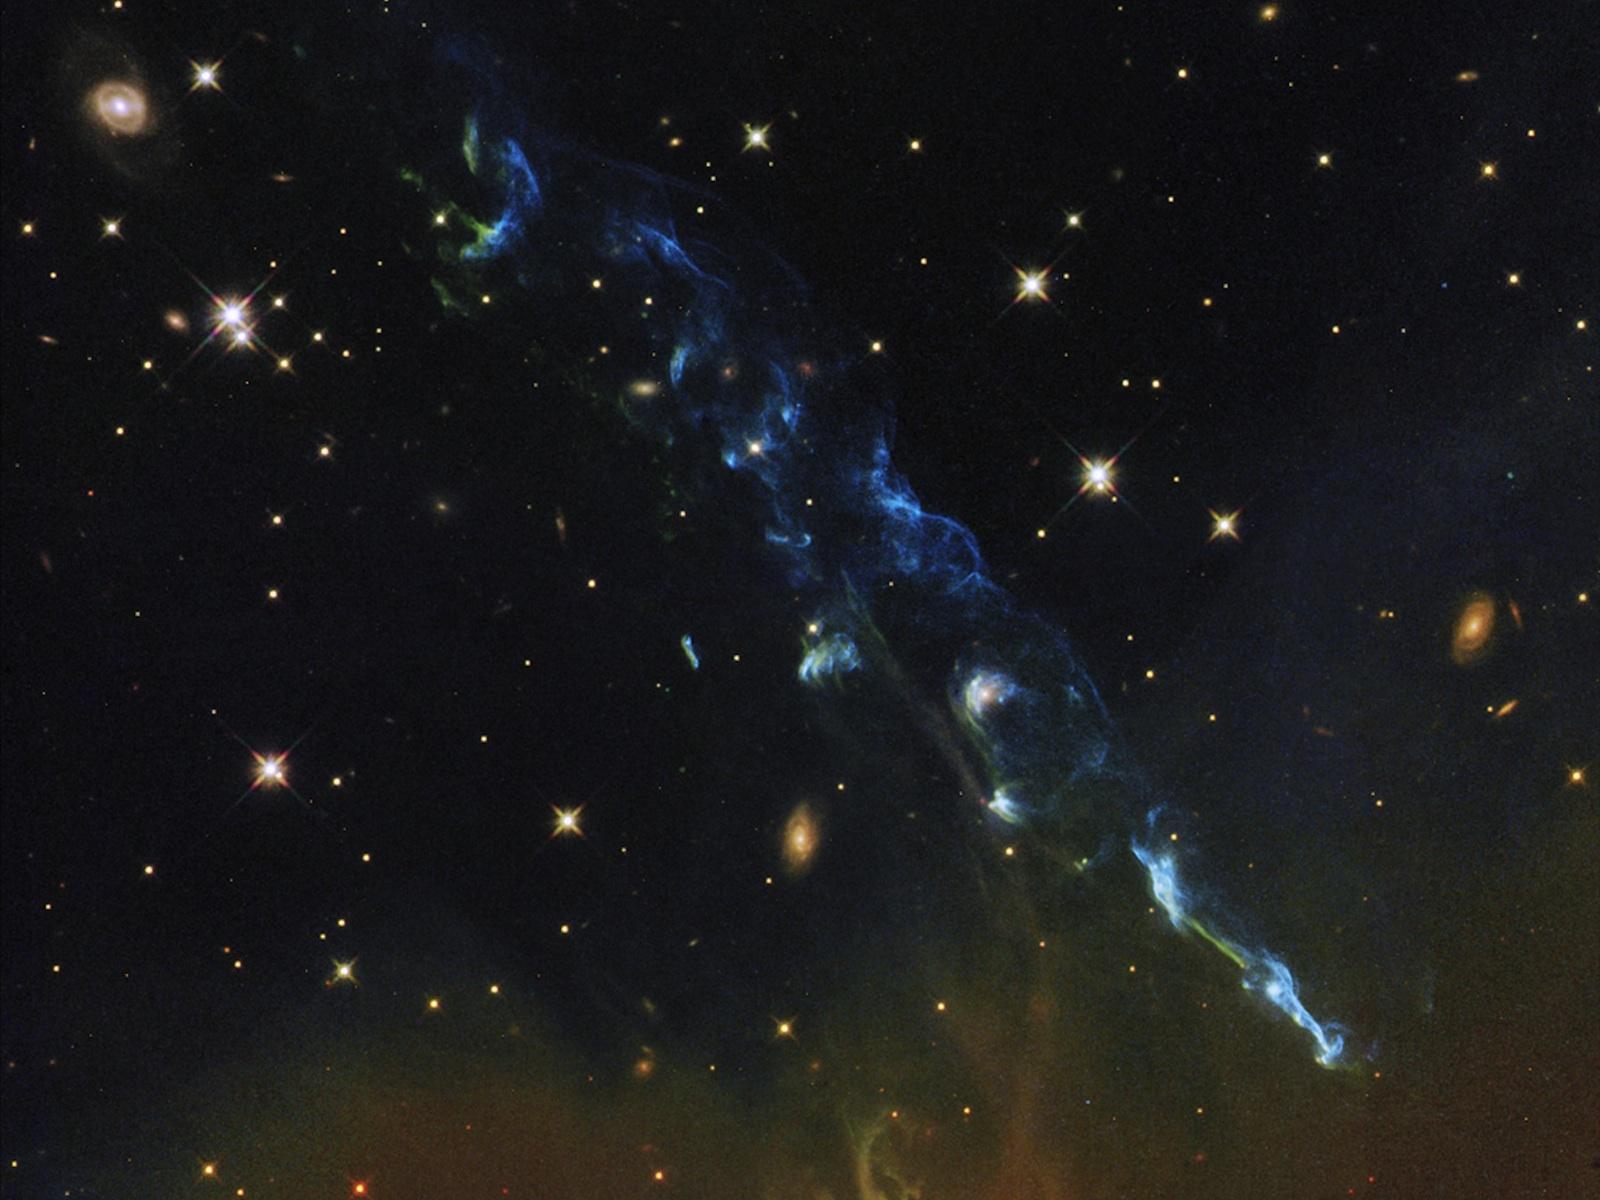 Cosmic Calendar Wallpaper : Nasa s hubble views a cosmic skyrocket space wallpaper